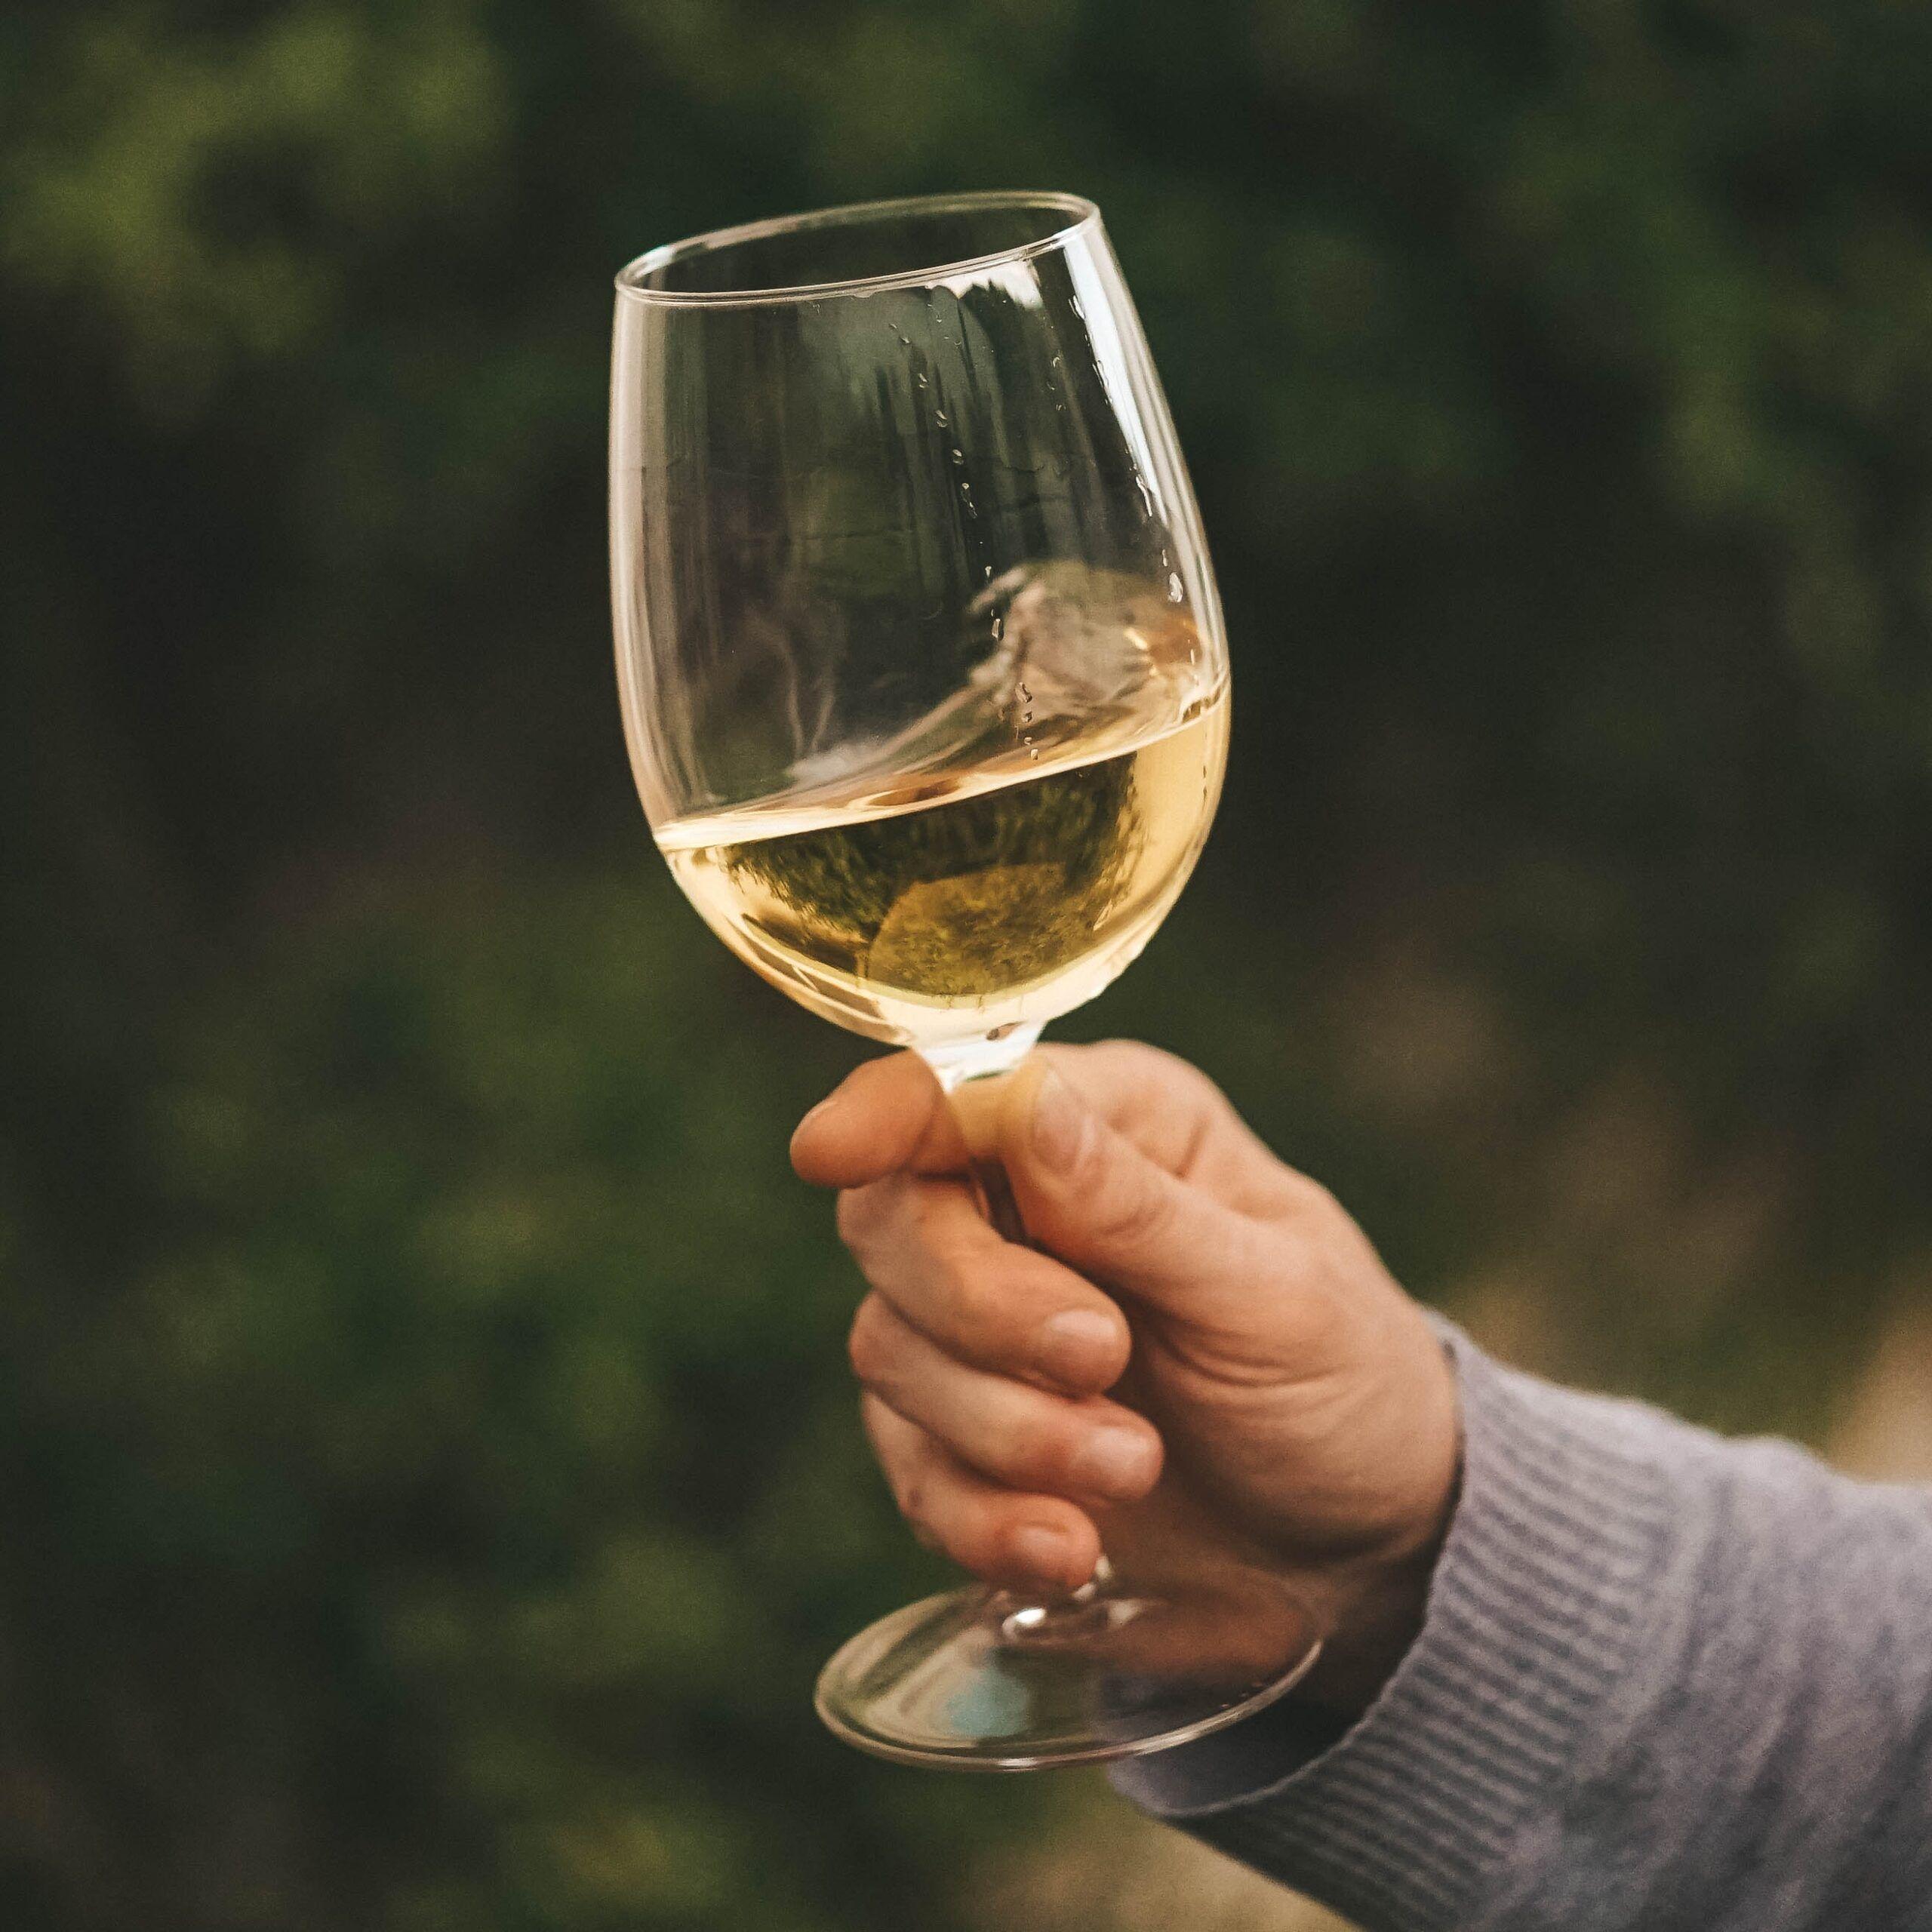 Mitos vino blanco se toma frio